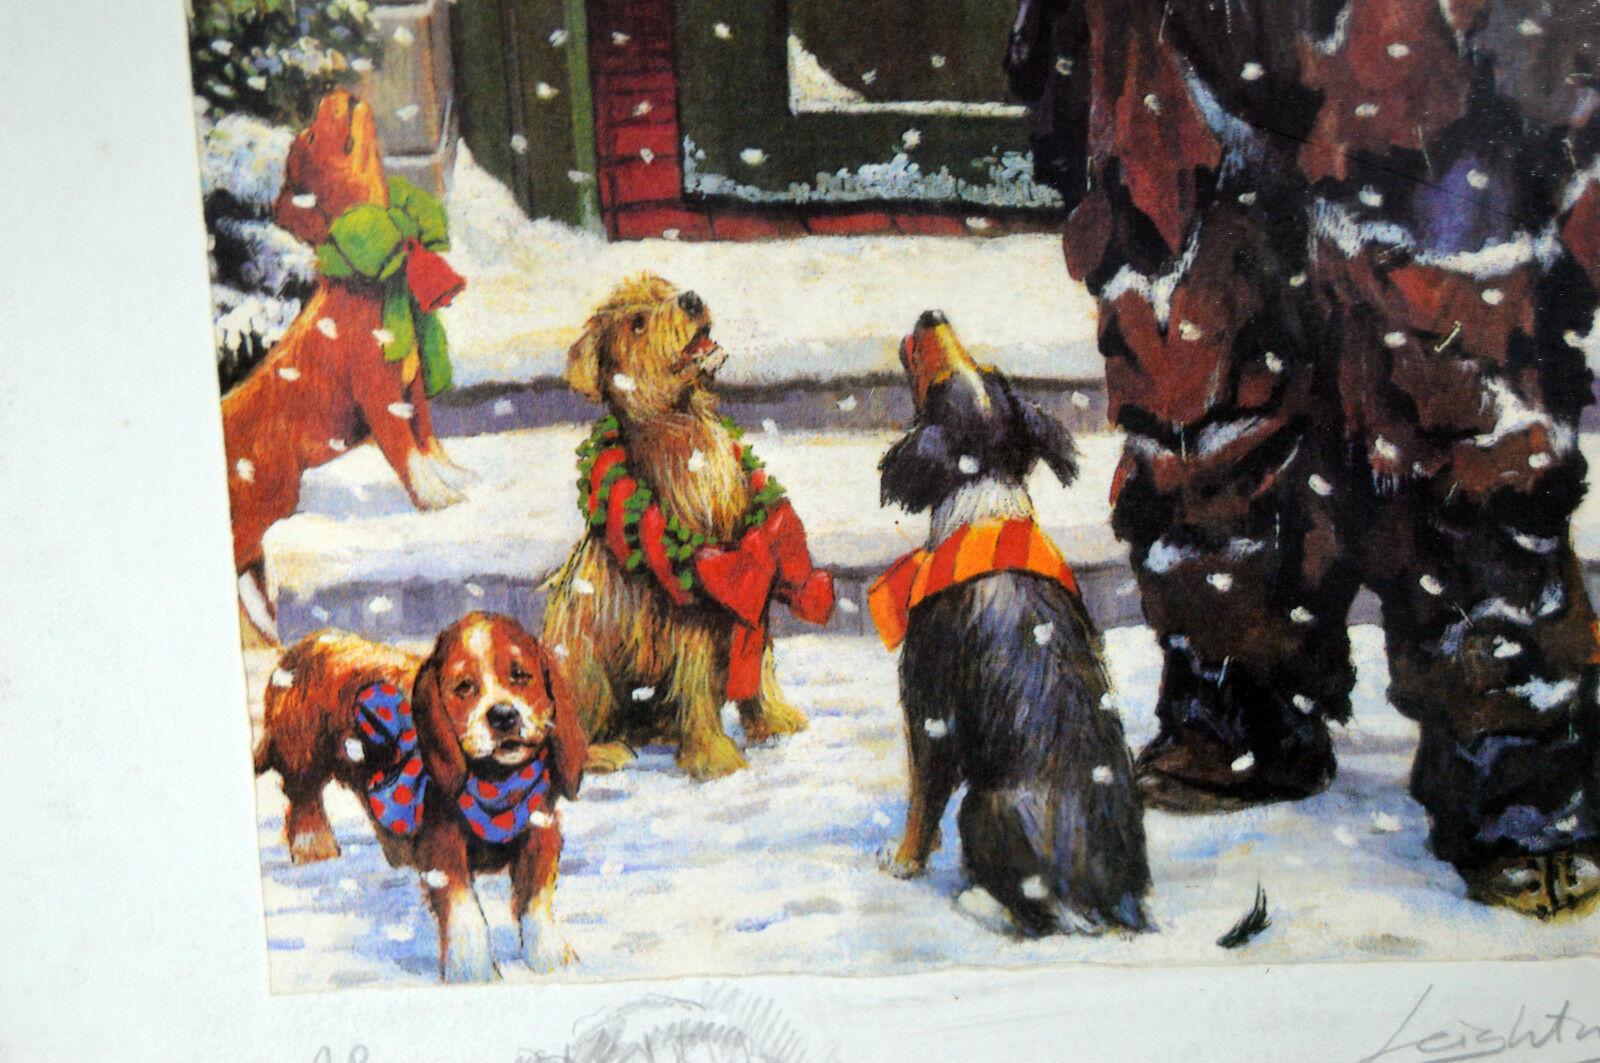 Unique Signed Artist Proof Leighton Jones Emmett Kelly Christmas Carol Scrooge image 4